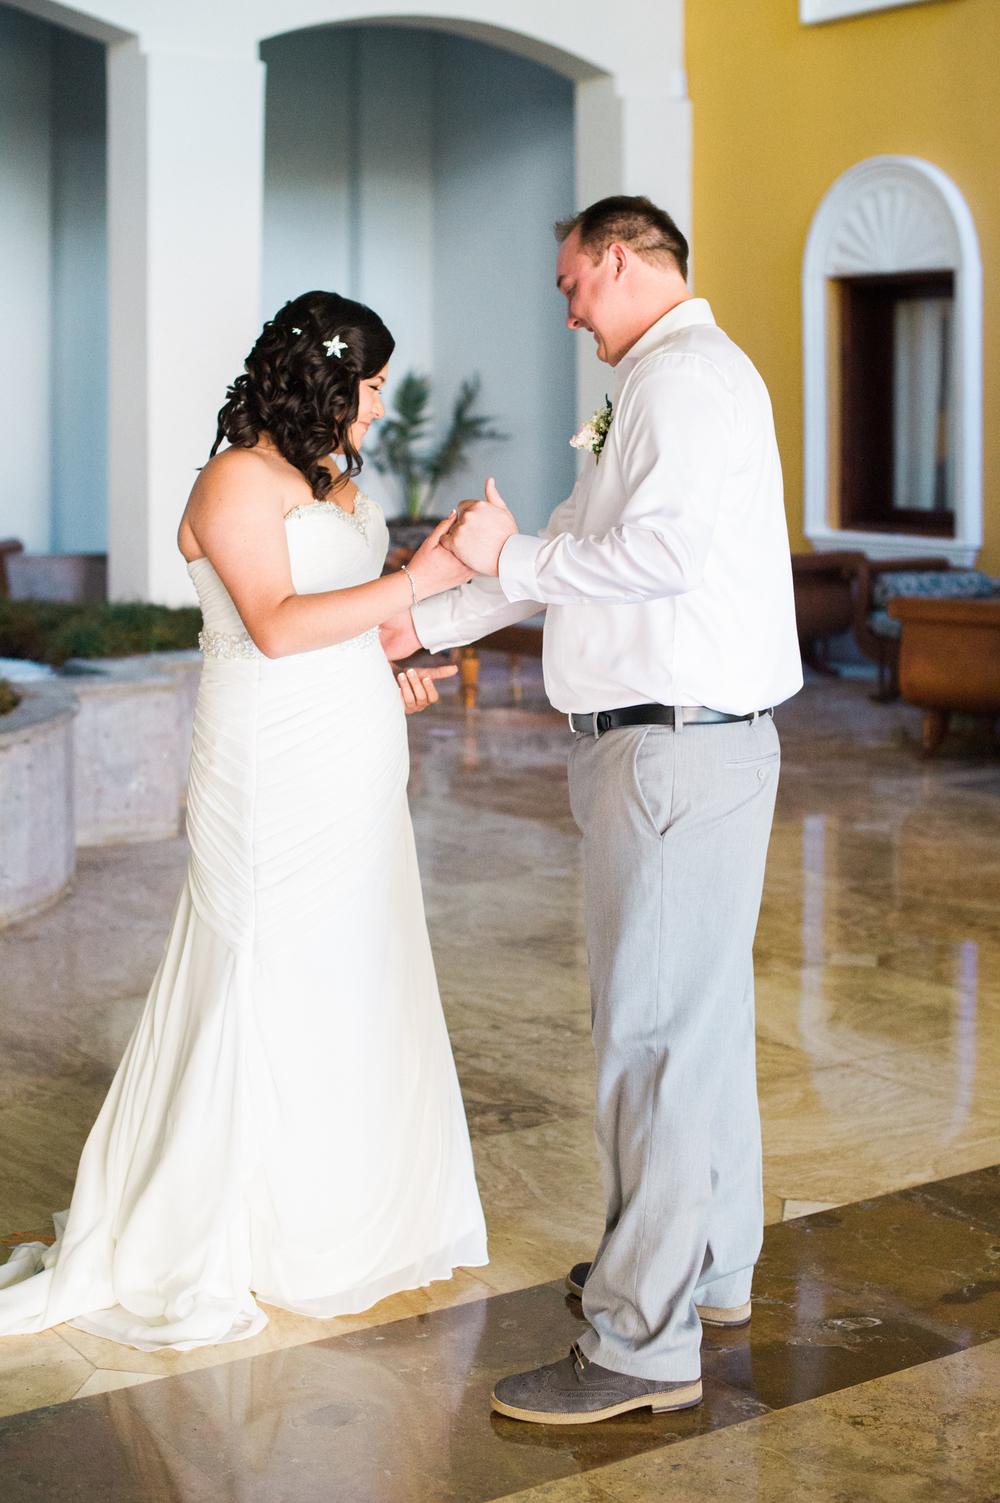 JadeandRyan-Montego-Bay-Jamaica-Wedding-Iberostar-Resort-Beach-30.jpg